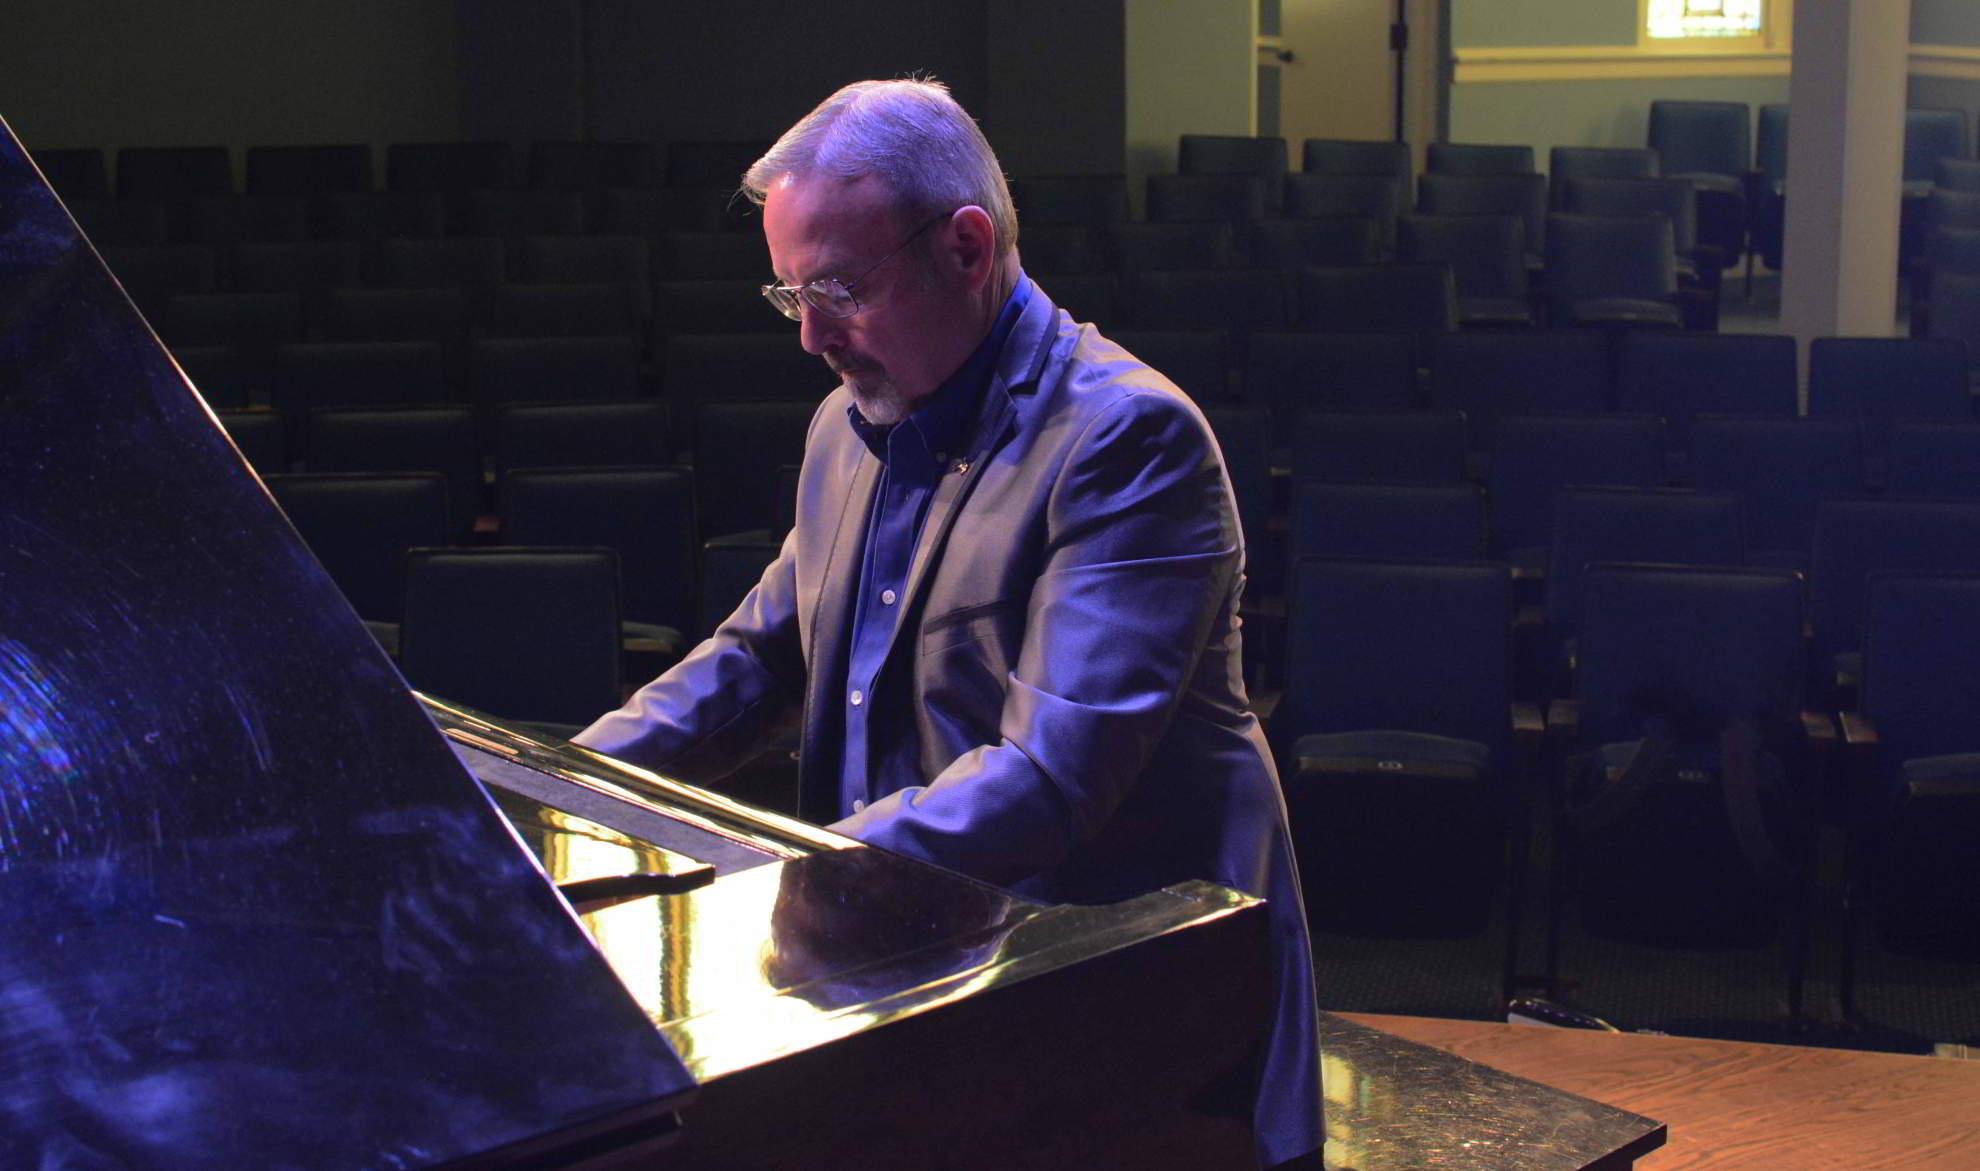 Ricky Sharpe at piano